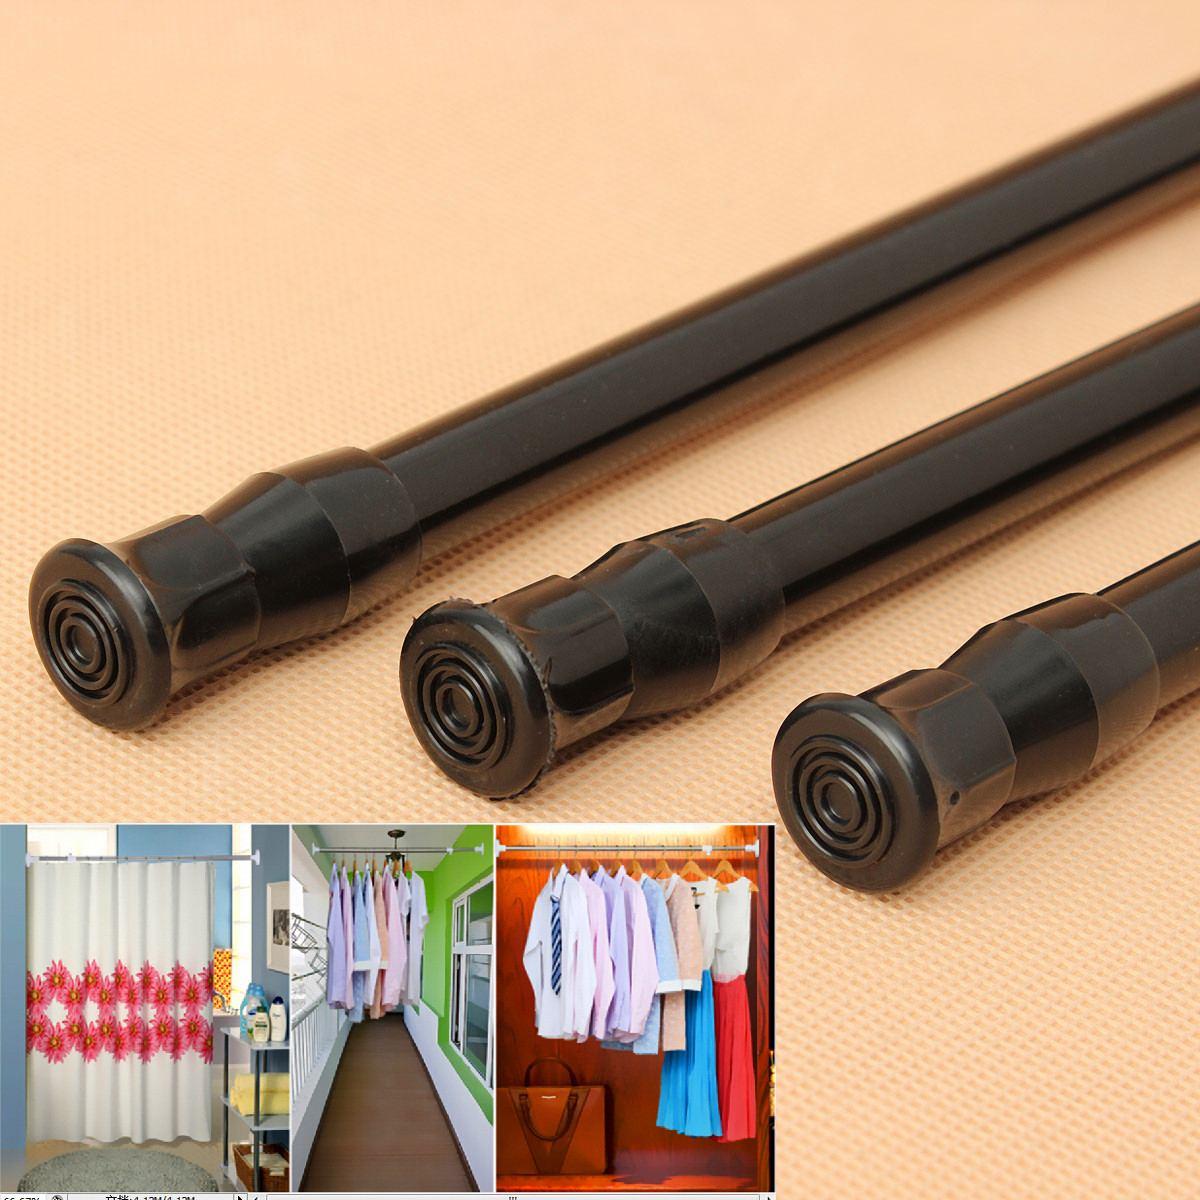 Barra de resorte ajustable extensible negra, barra de tensión telescópica para cortina de ventana, Barra de ducha, armario, productos de baño